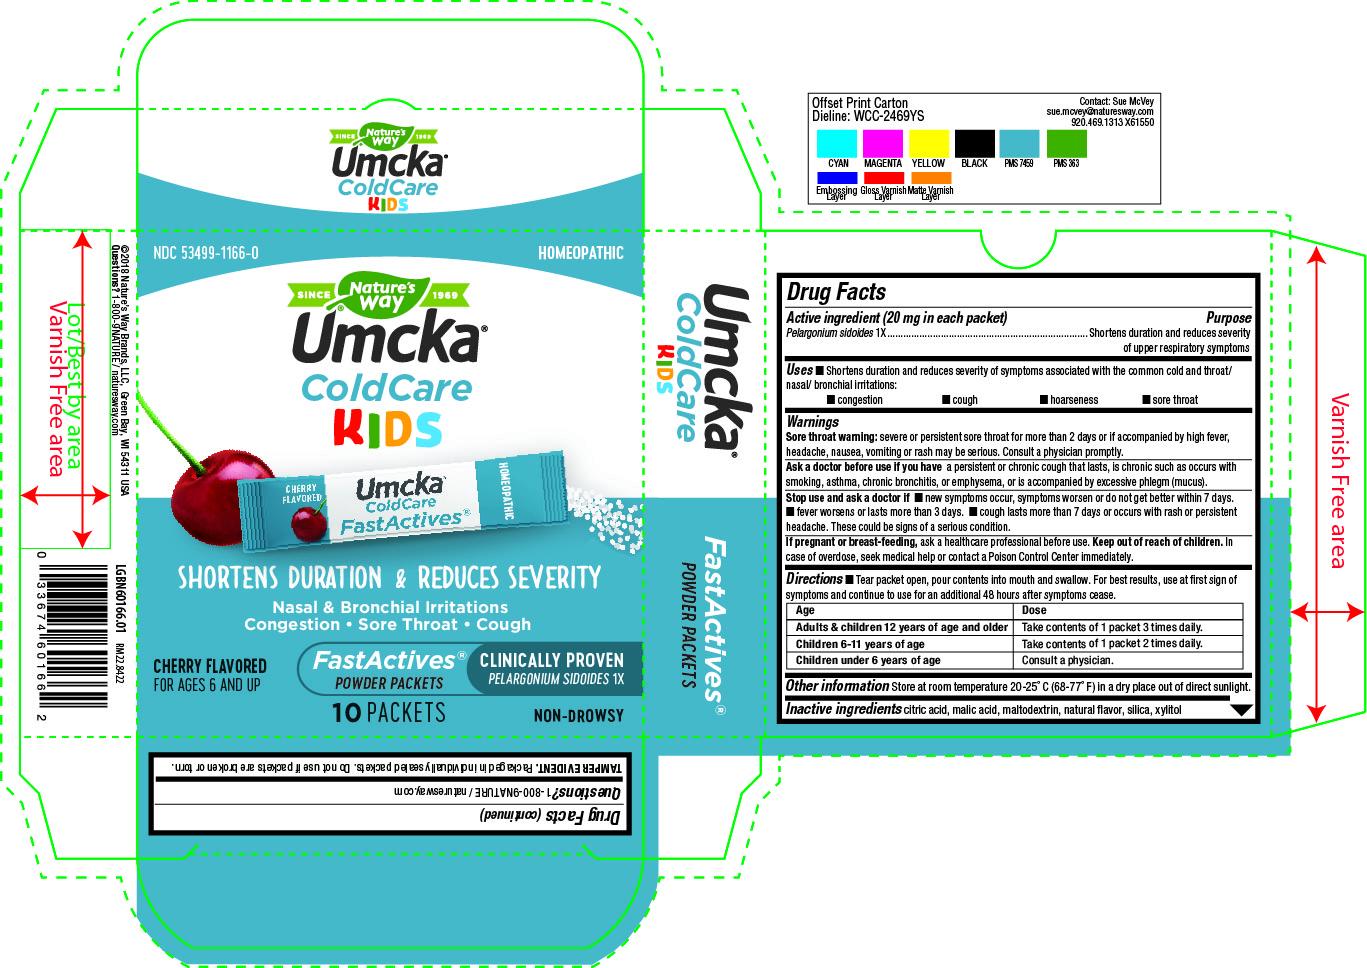 Umcka 60166 CC Fastactives Cherry.jpg